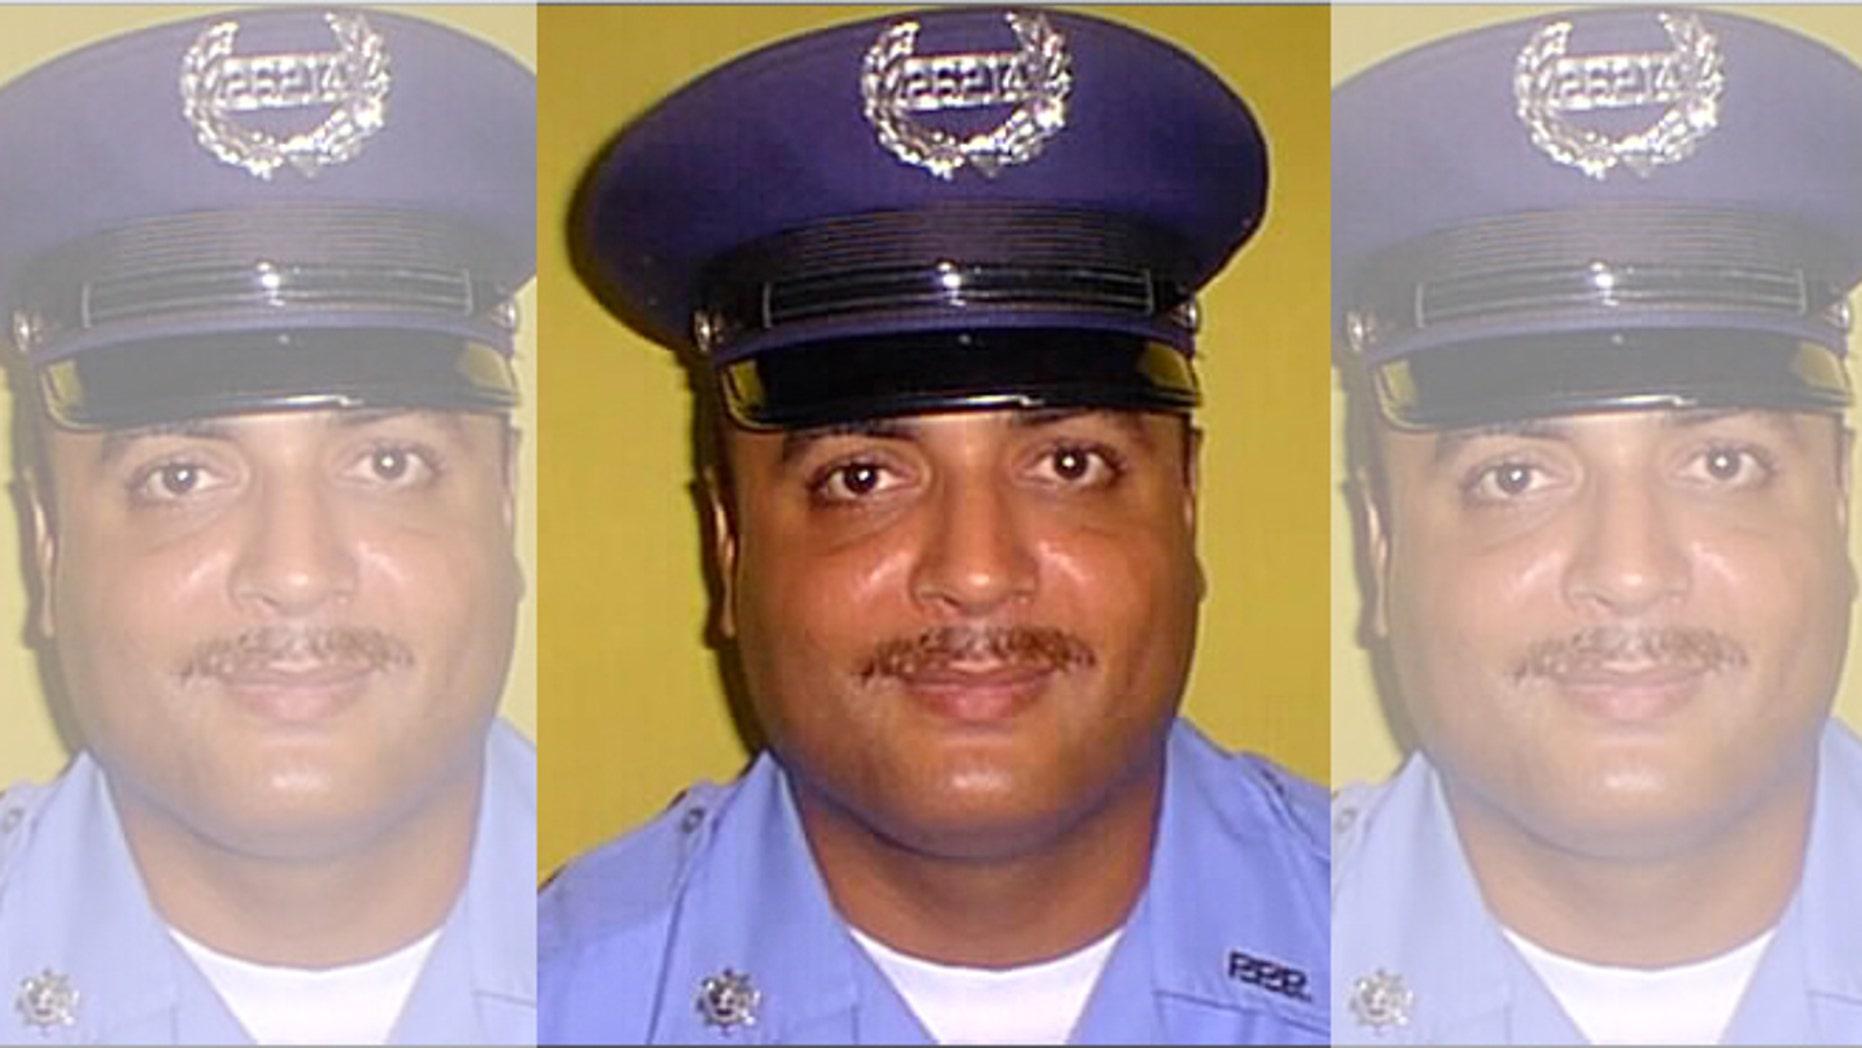 Undated photo of officer Guarionex Candelario Rivera in his uniform in Puerto Rico.